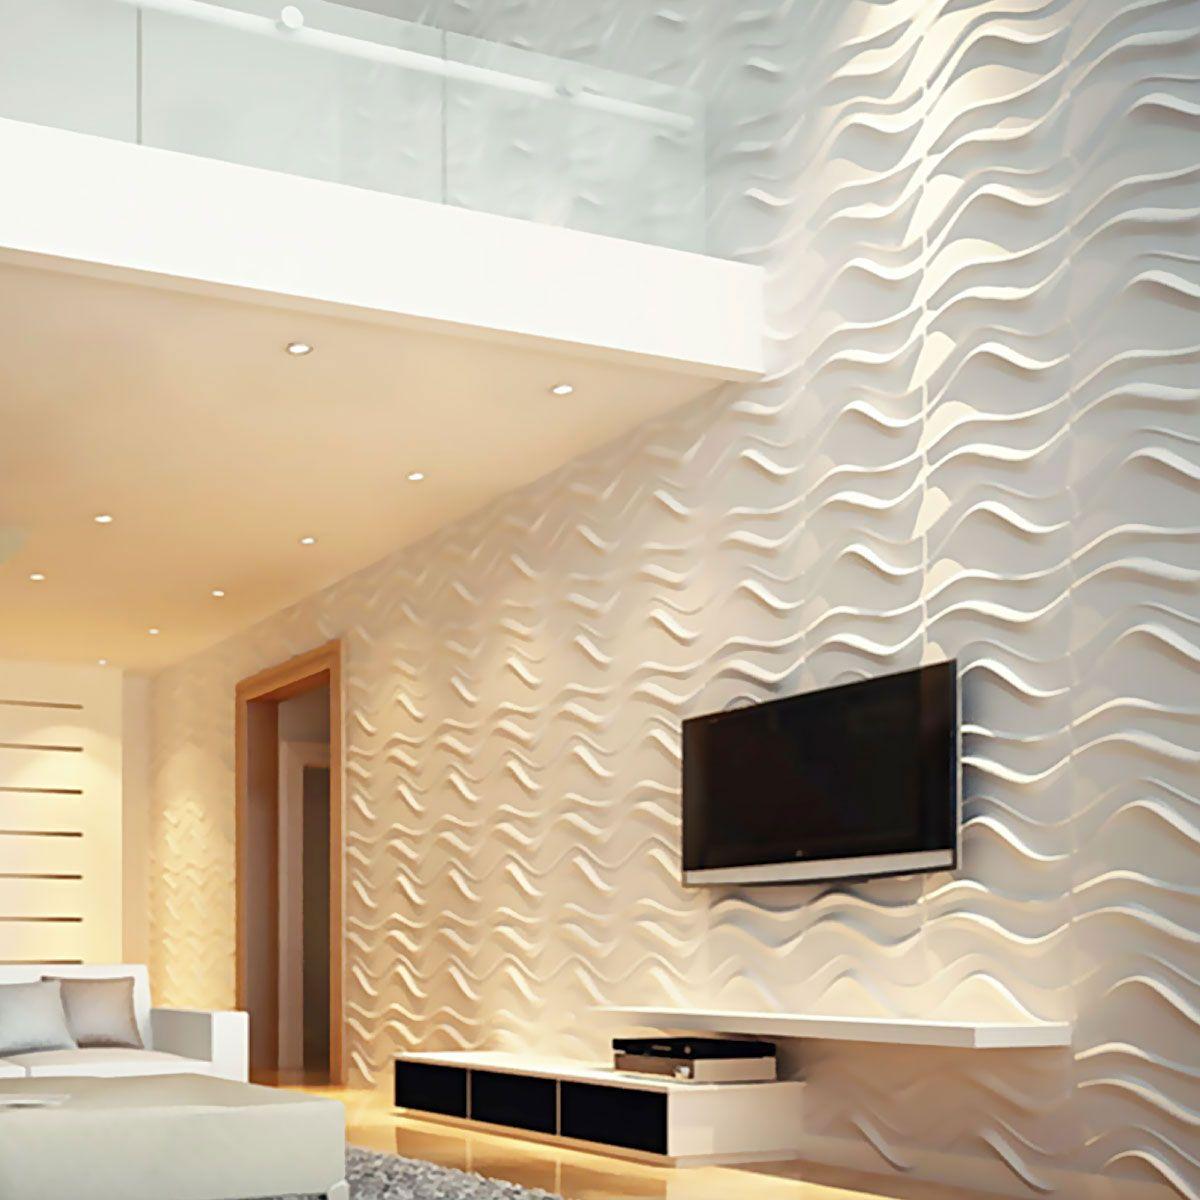 Home Design 3d Remove Wall: 19 5/8-Inch W X 19 5/8-Inch H Wave EnduraWall Decorative